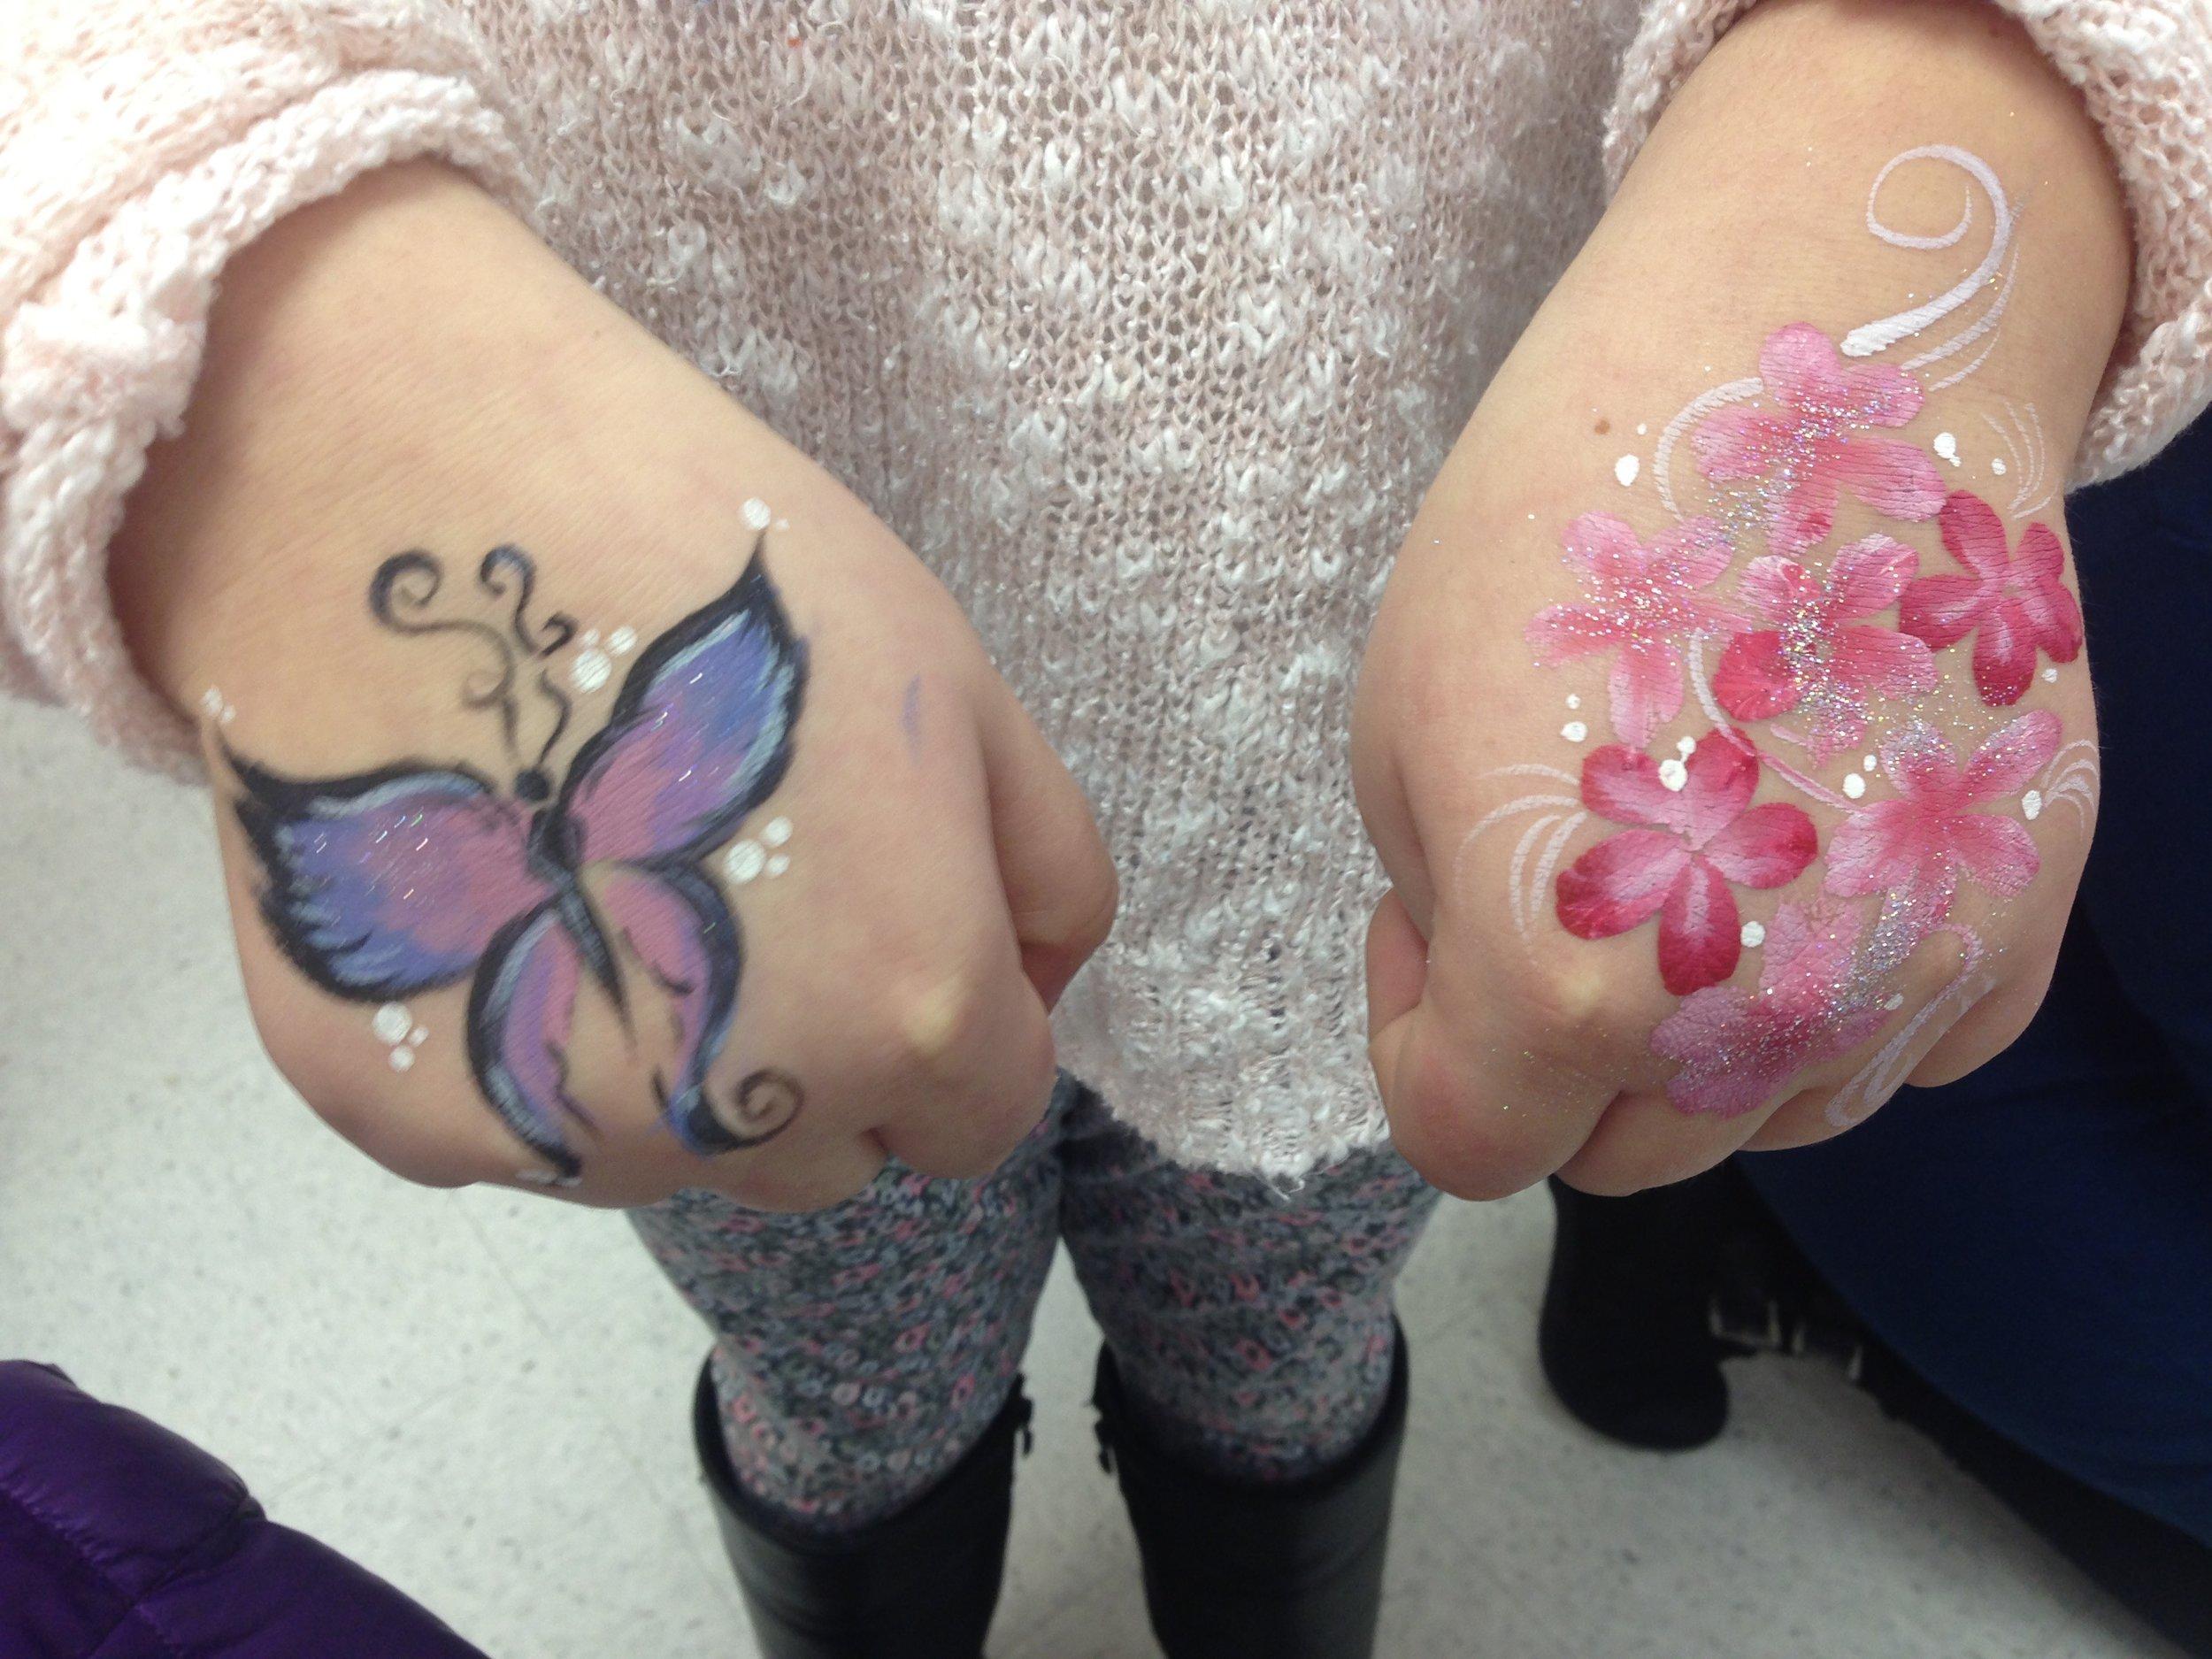 Gallery - Body Paint girl hands.jpg